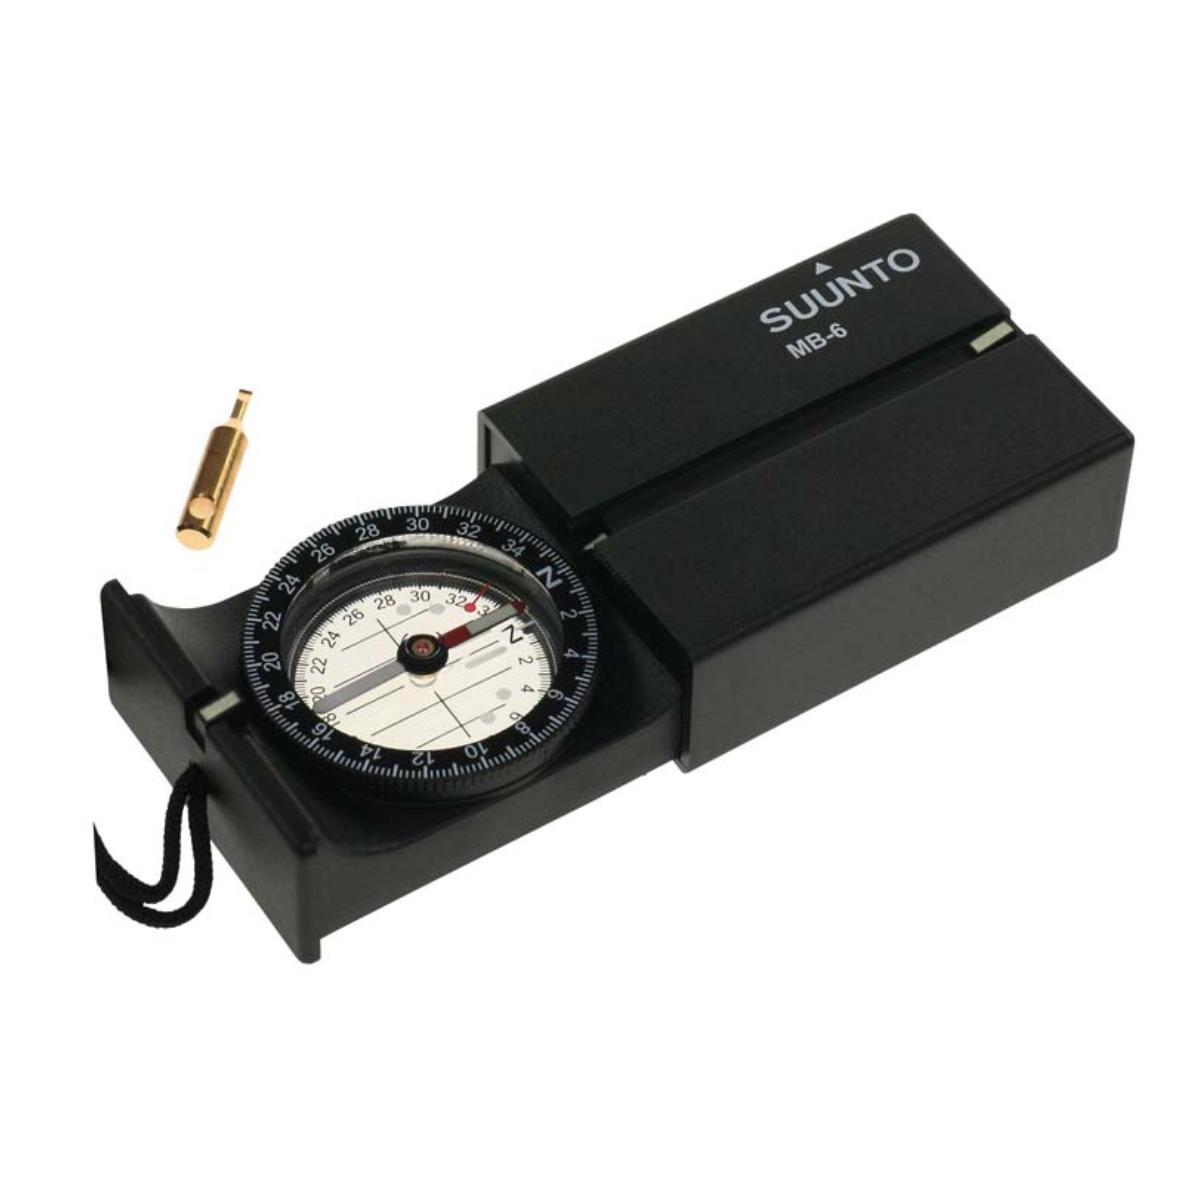 SUUNTO MB-6NH Kompass